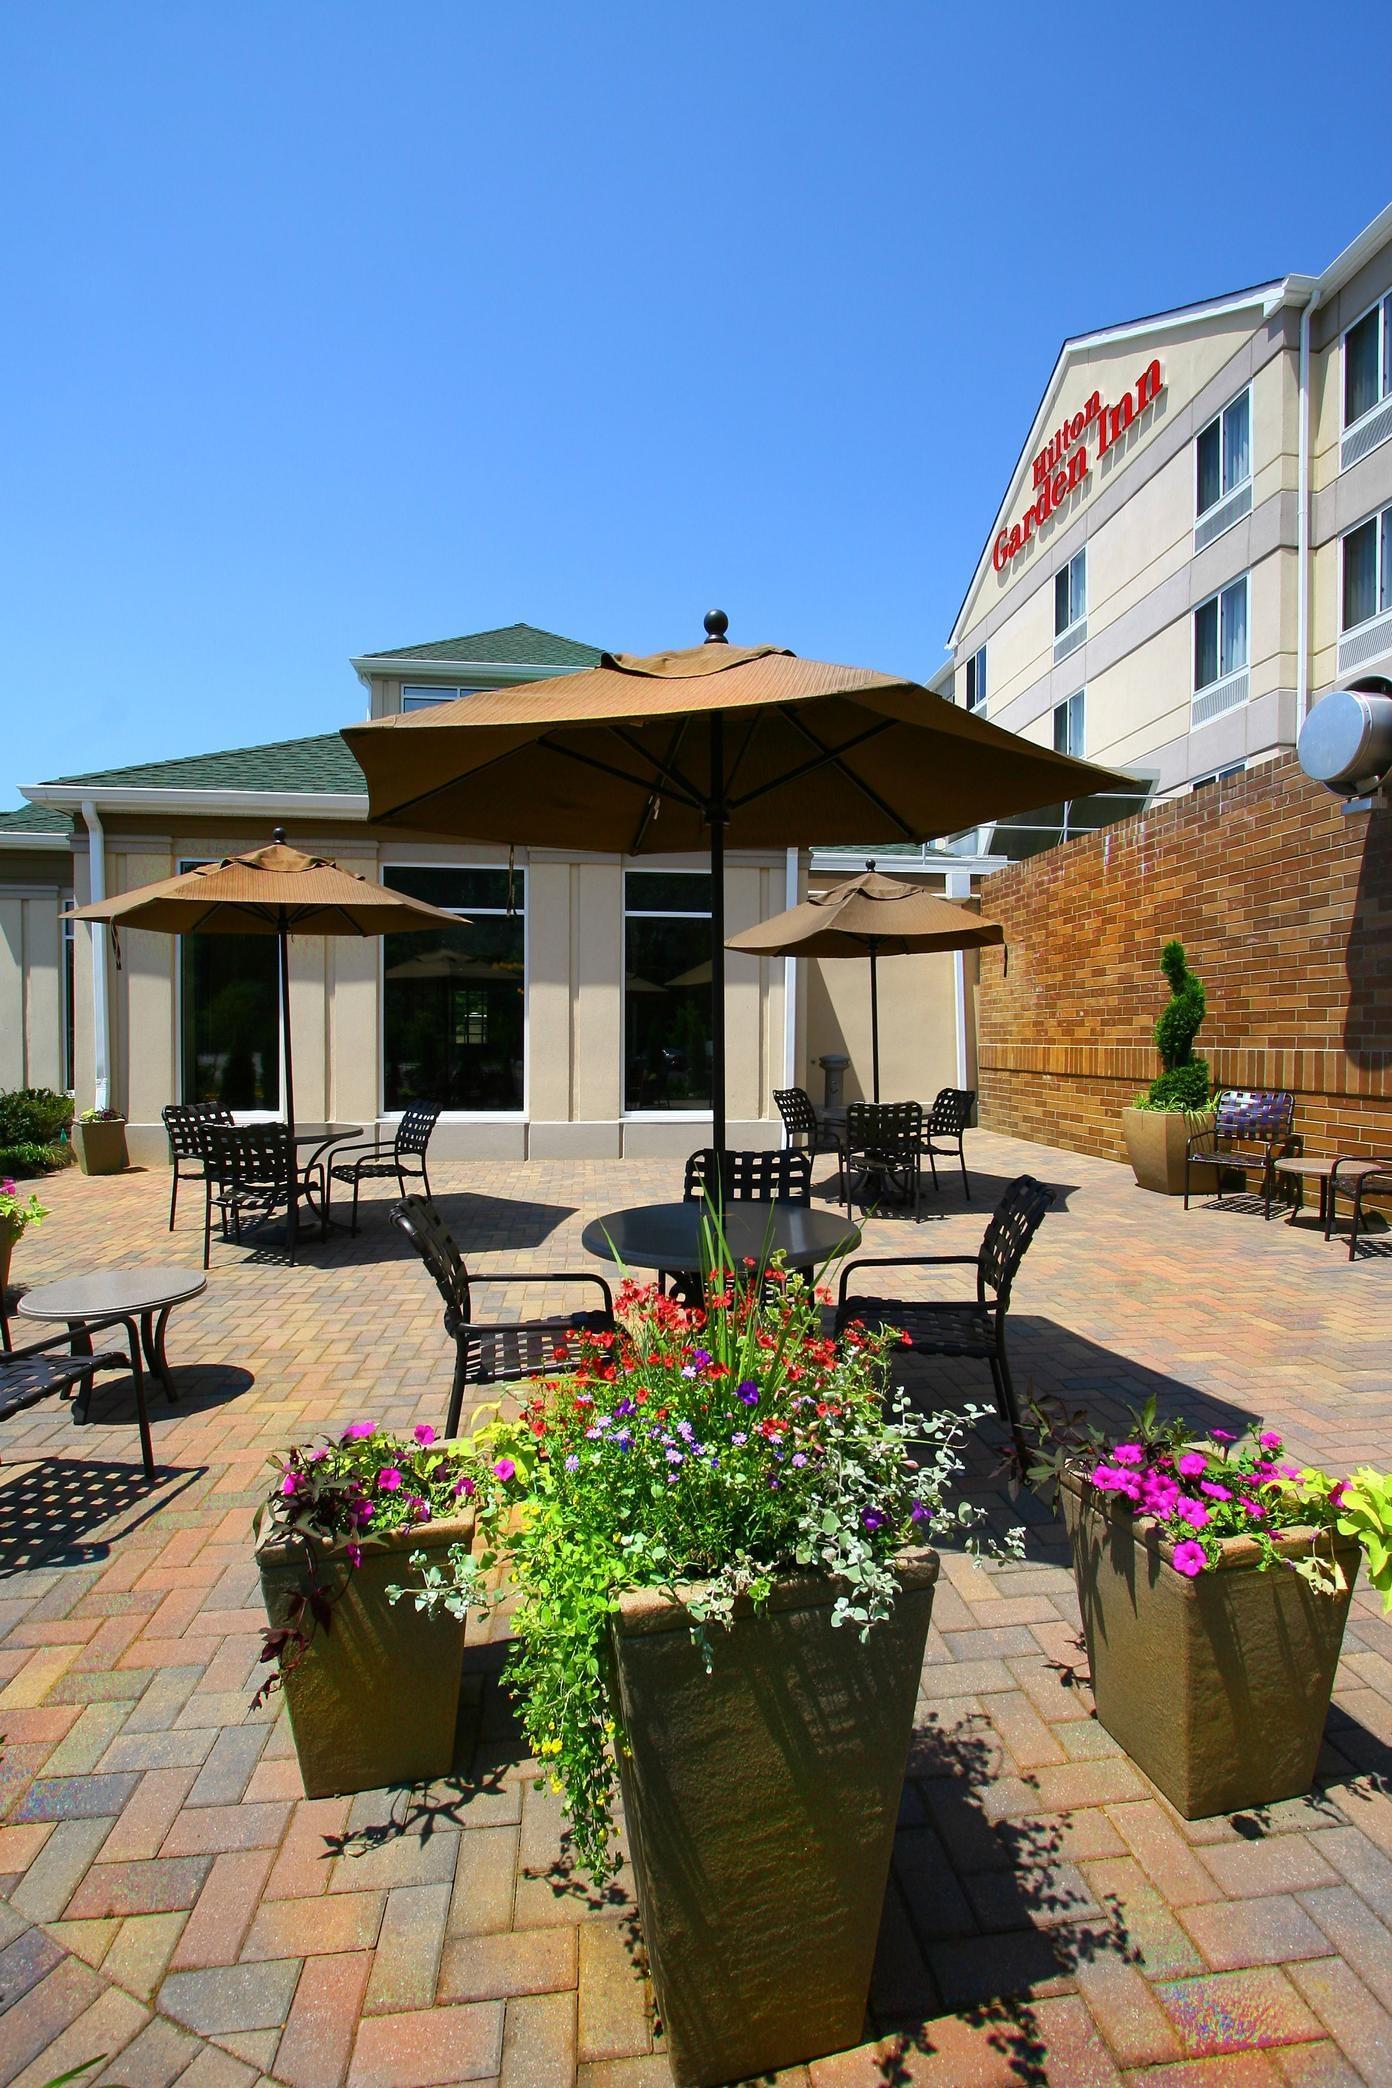 Hilton Hotels Annapolis Md